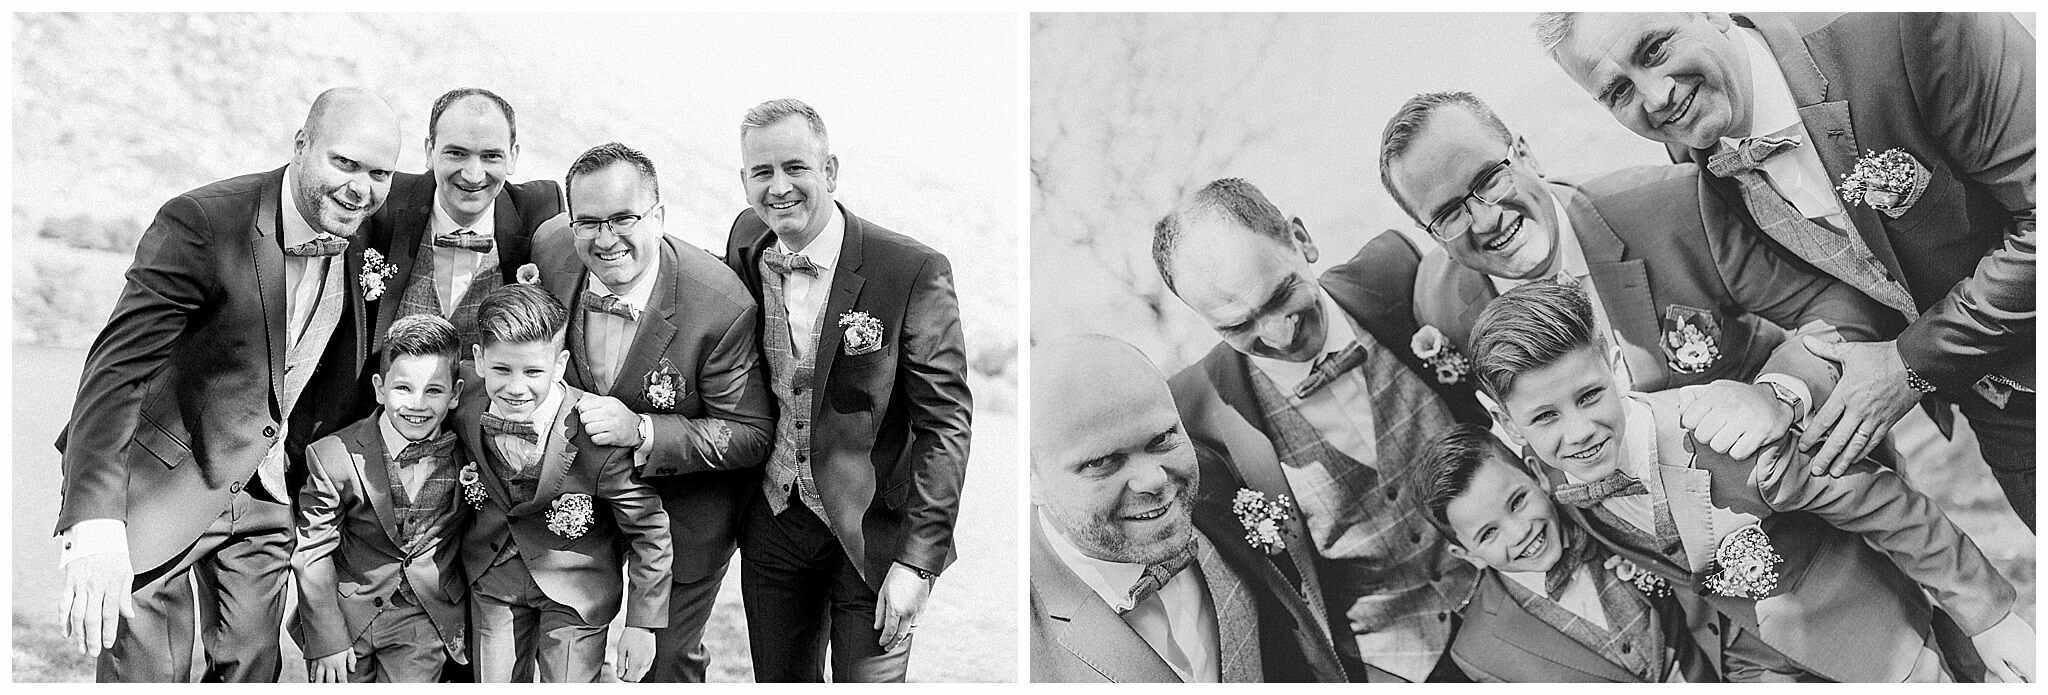 Deirdre + James wedding in Gougane Barra 5